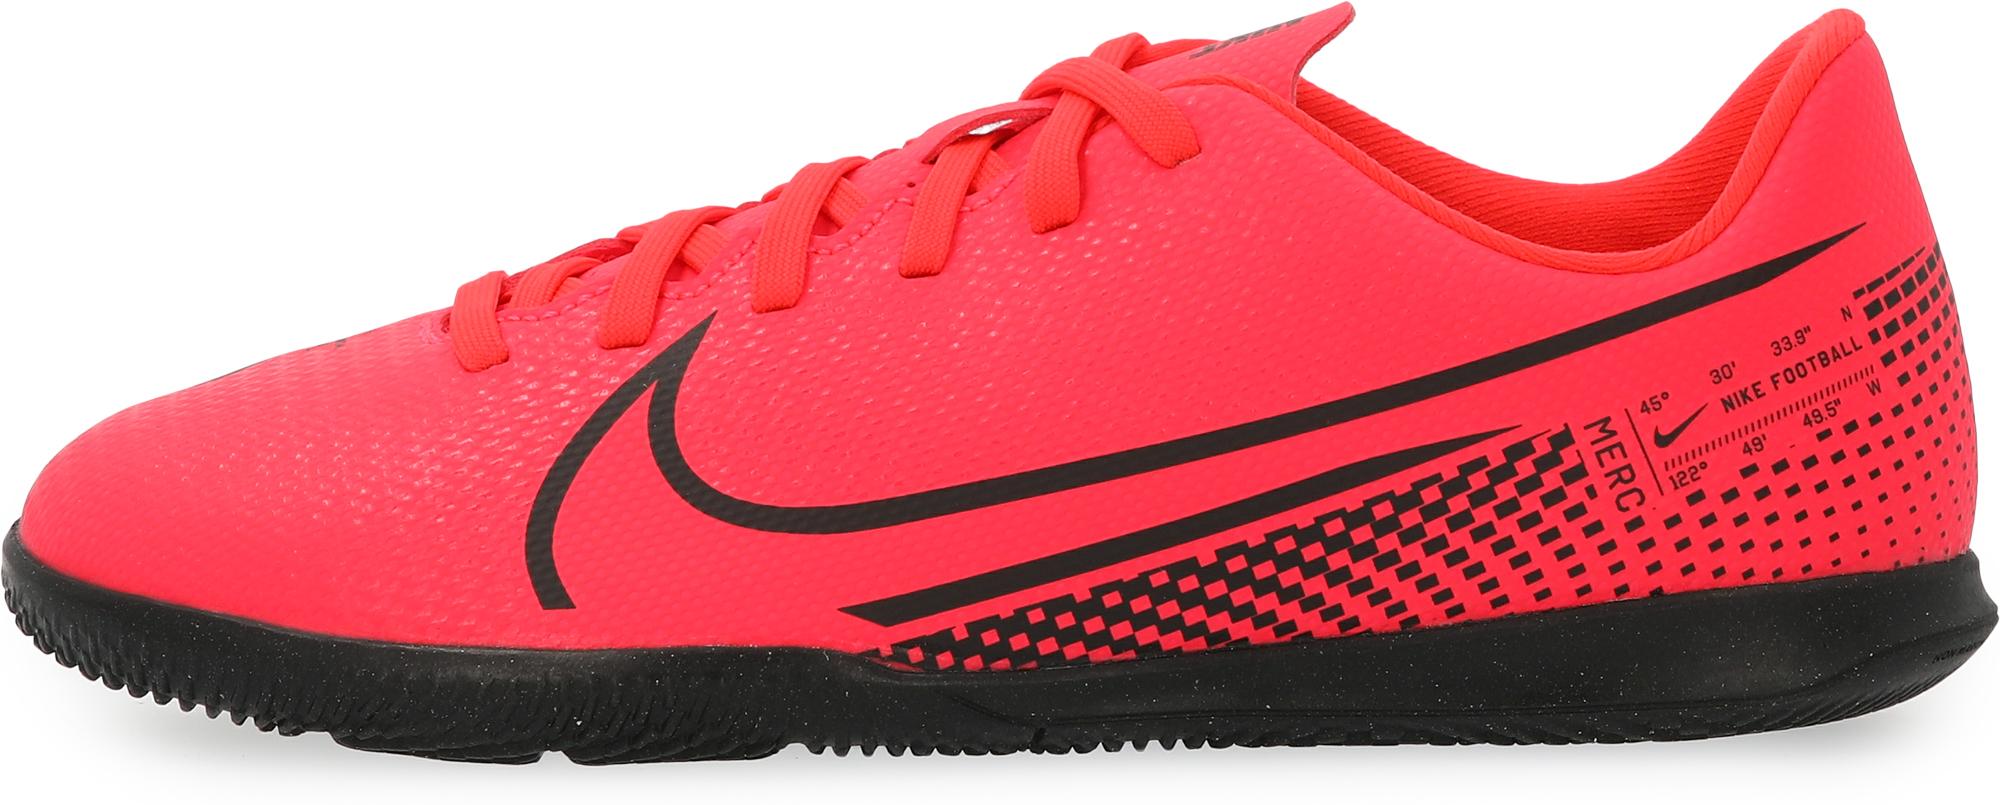 Nike Бутсы для мальчиков Nike Jr. Mercurial Vapor 13 Club IC, размер 35 бутсы детские nike vapor 13 club mg ps at8162 010